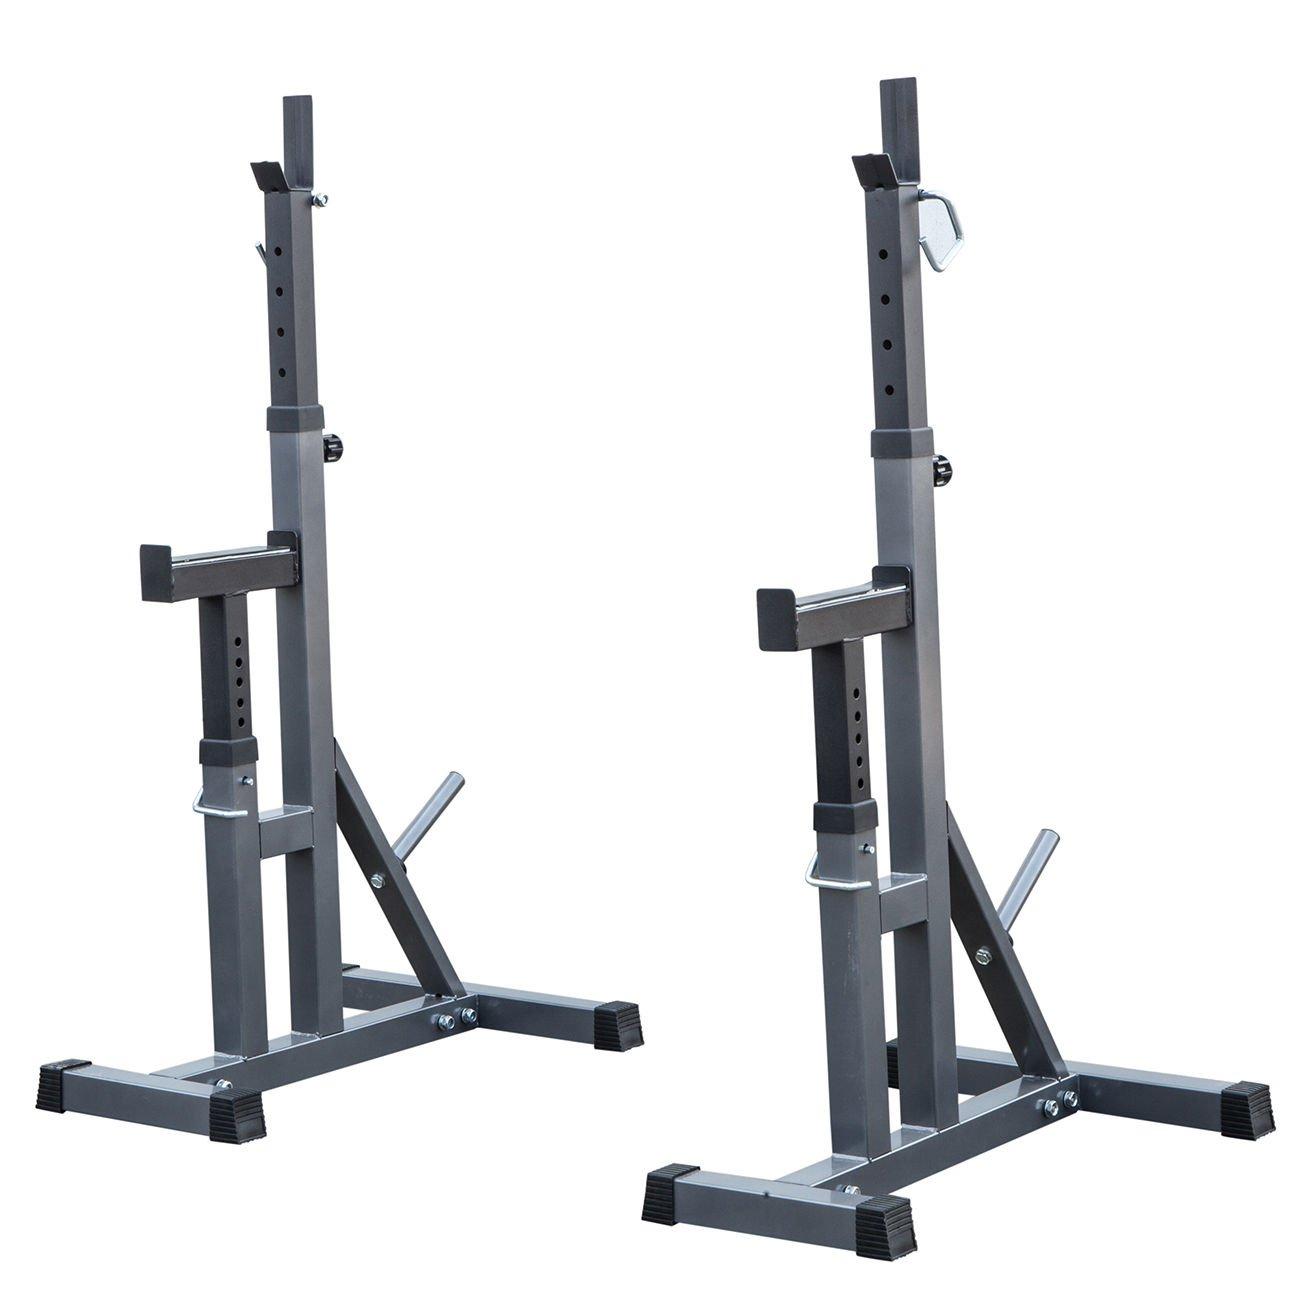 2pcs Adjustable Rack Standard Steel Squat Stands Barbell Free Press Bench w/ Peg